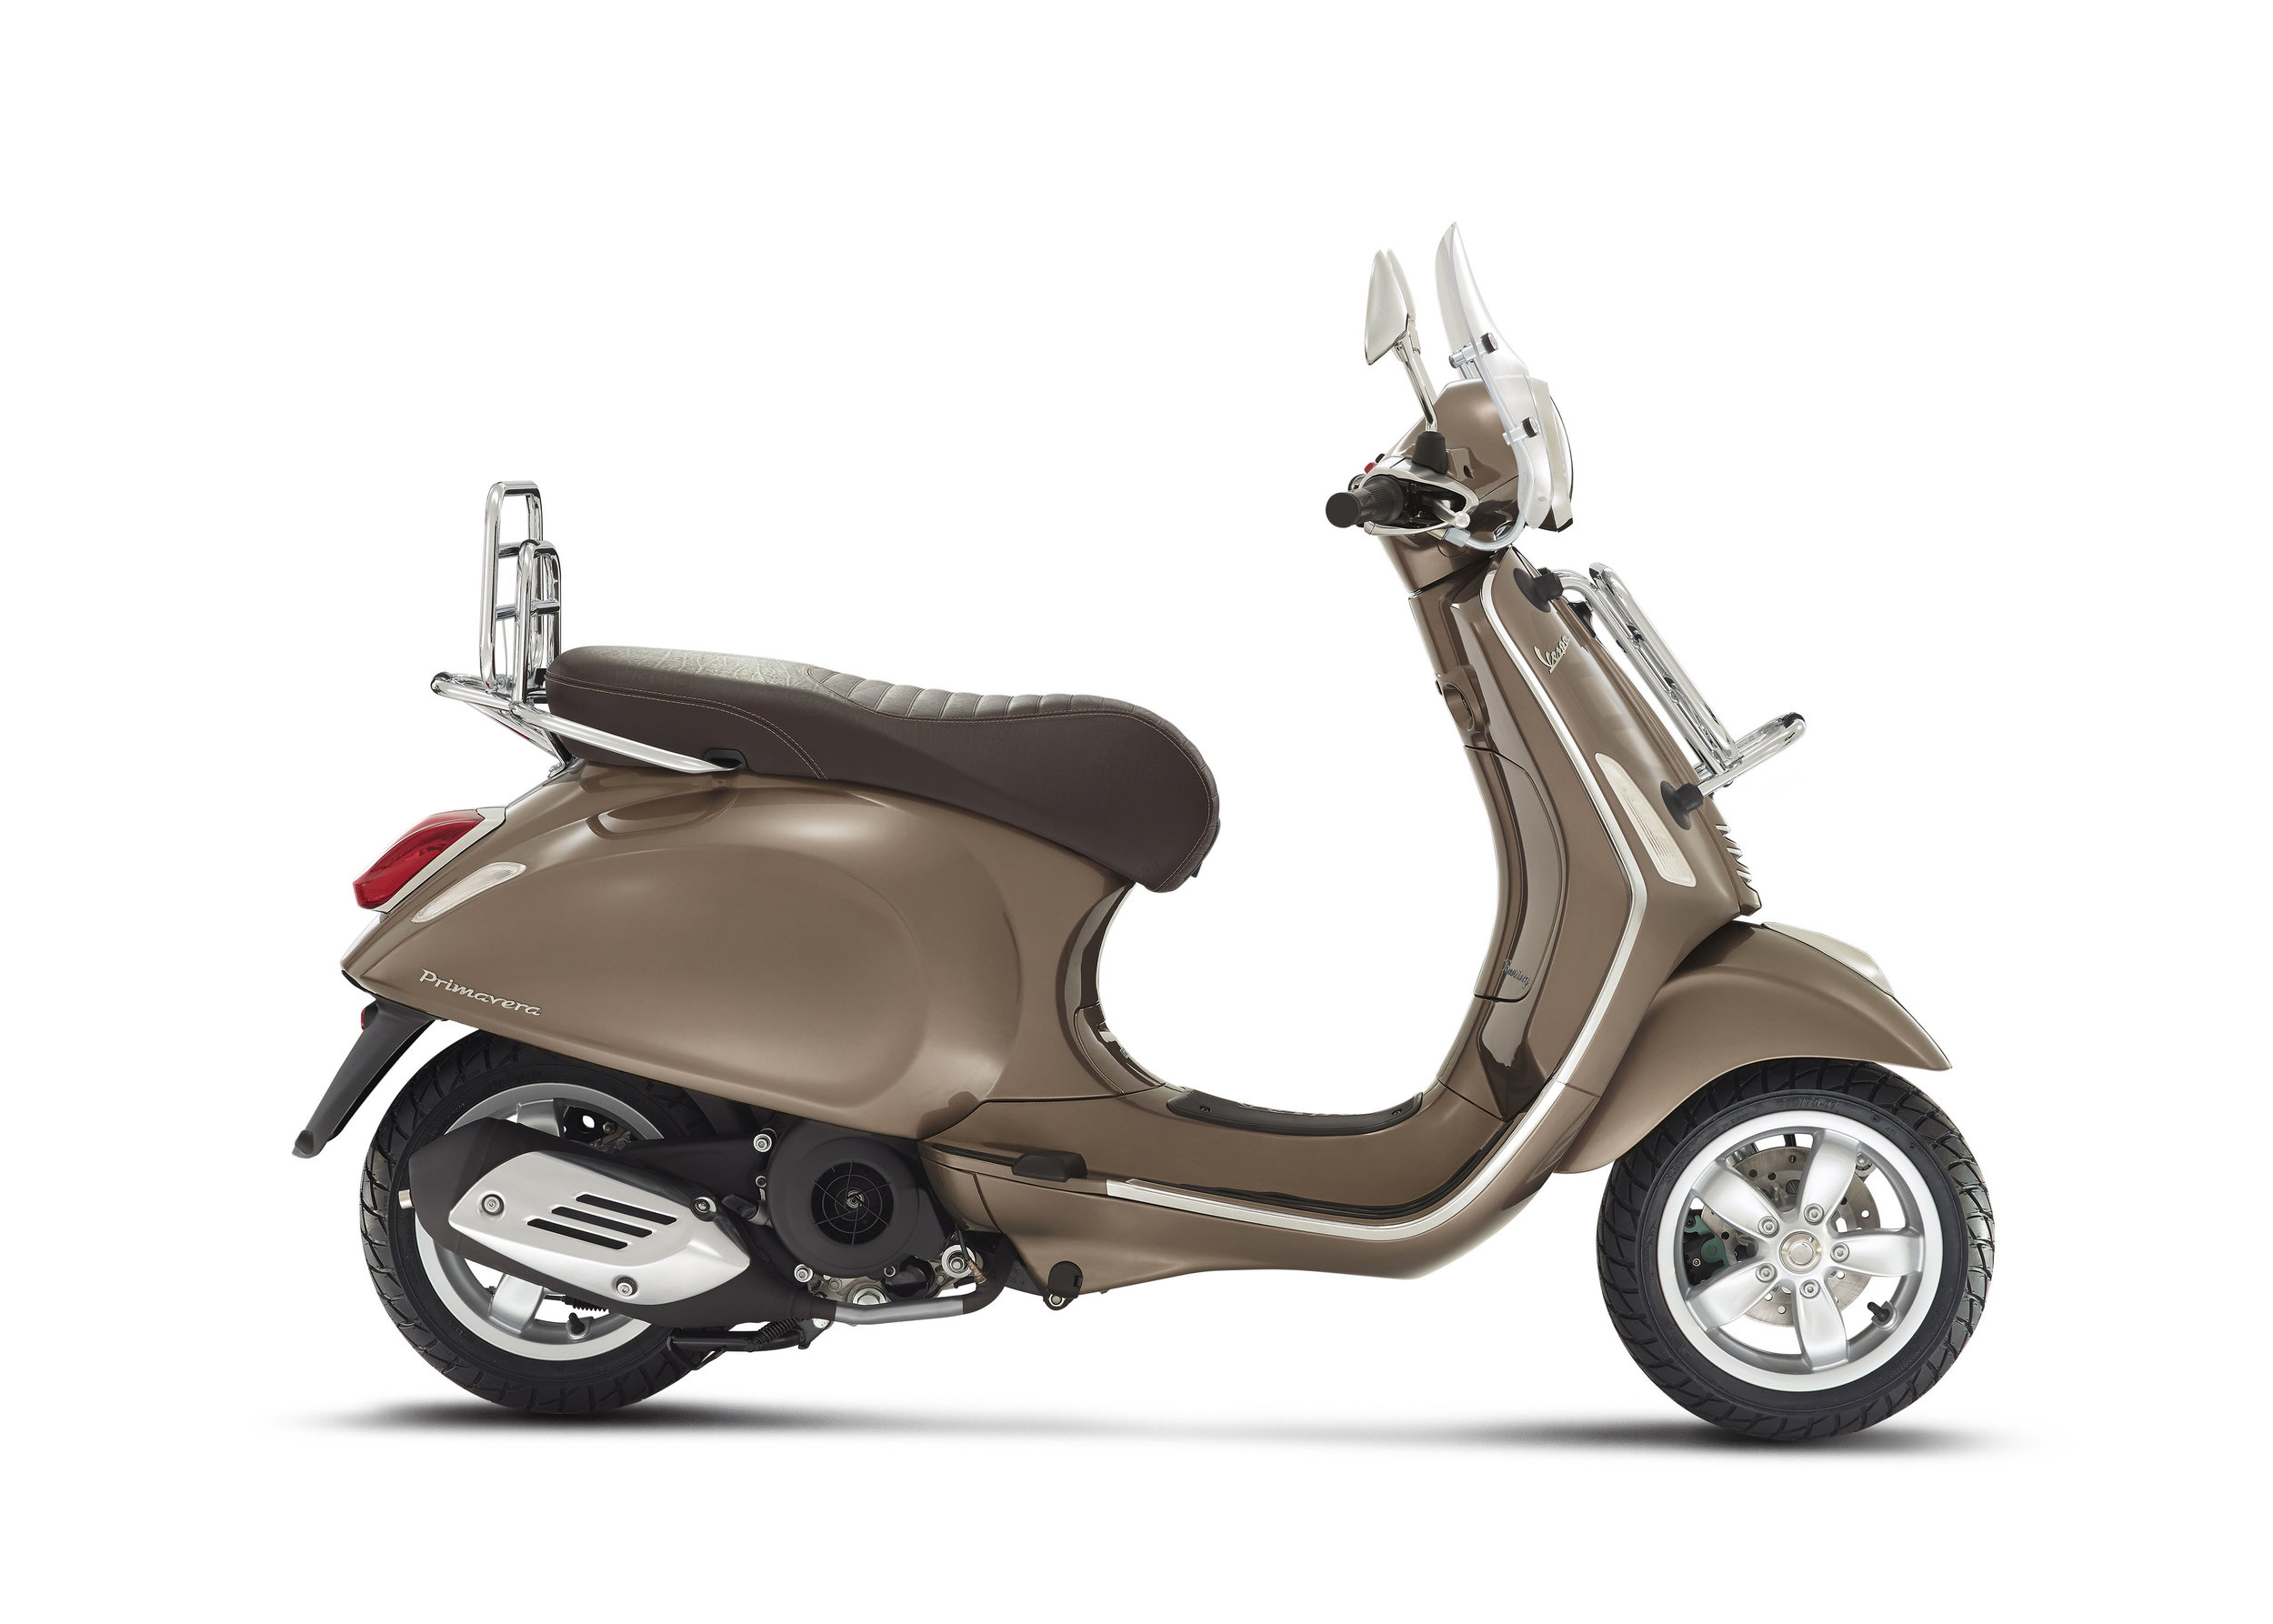 Vespa Primavera Touring 50-125-150 marrone_LatDX.jpg